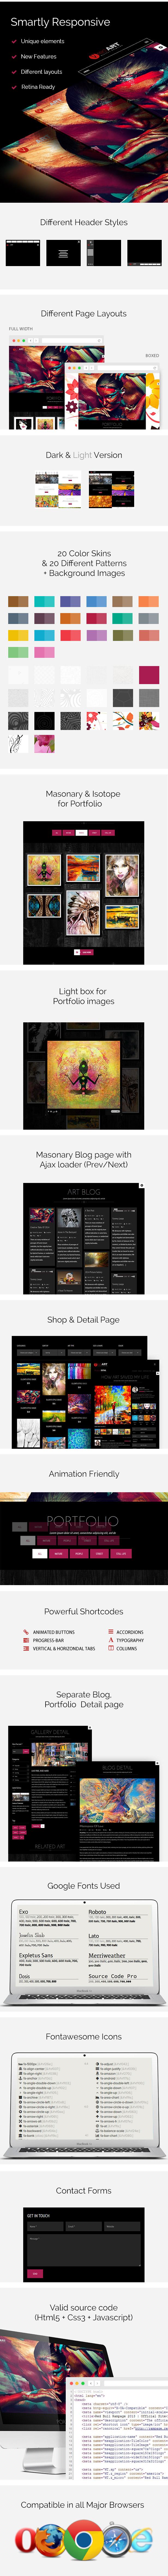 Red Art - HTML Portfolio / Art Gallery Website Template - 1